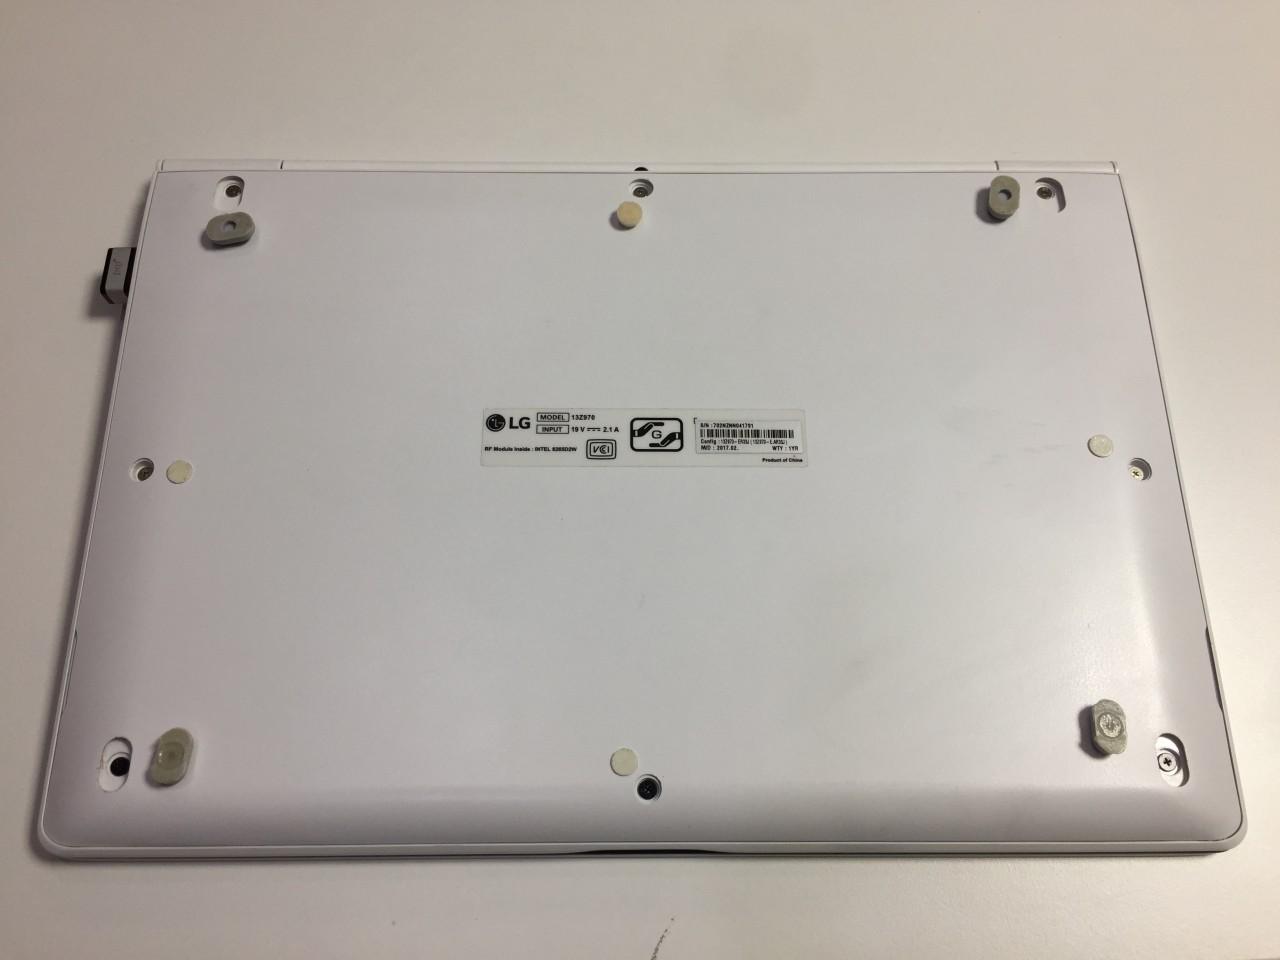 LG gram 13Z970 底面パネル